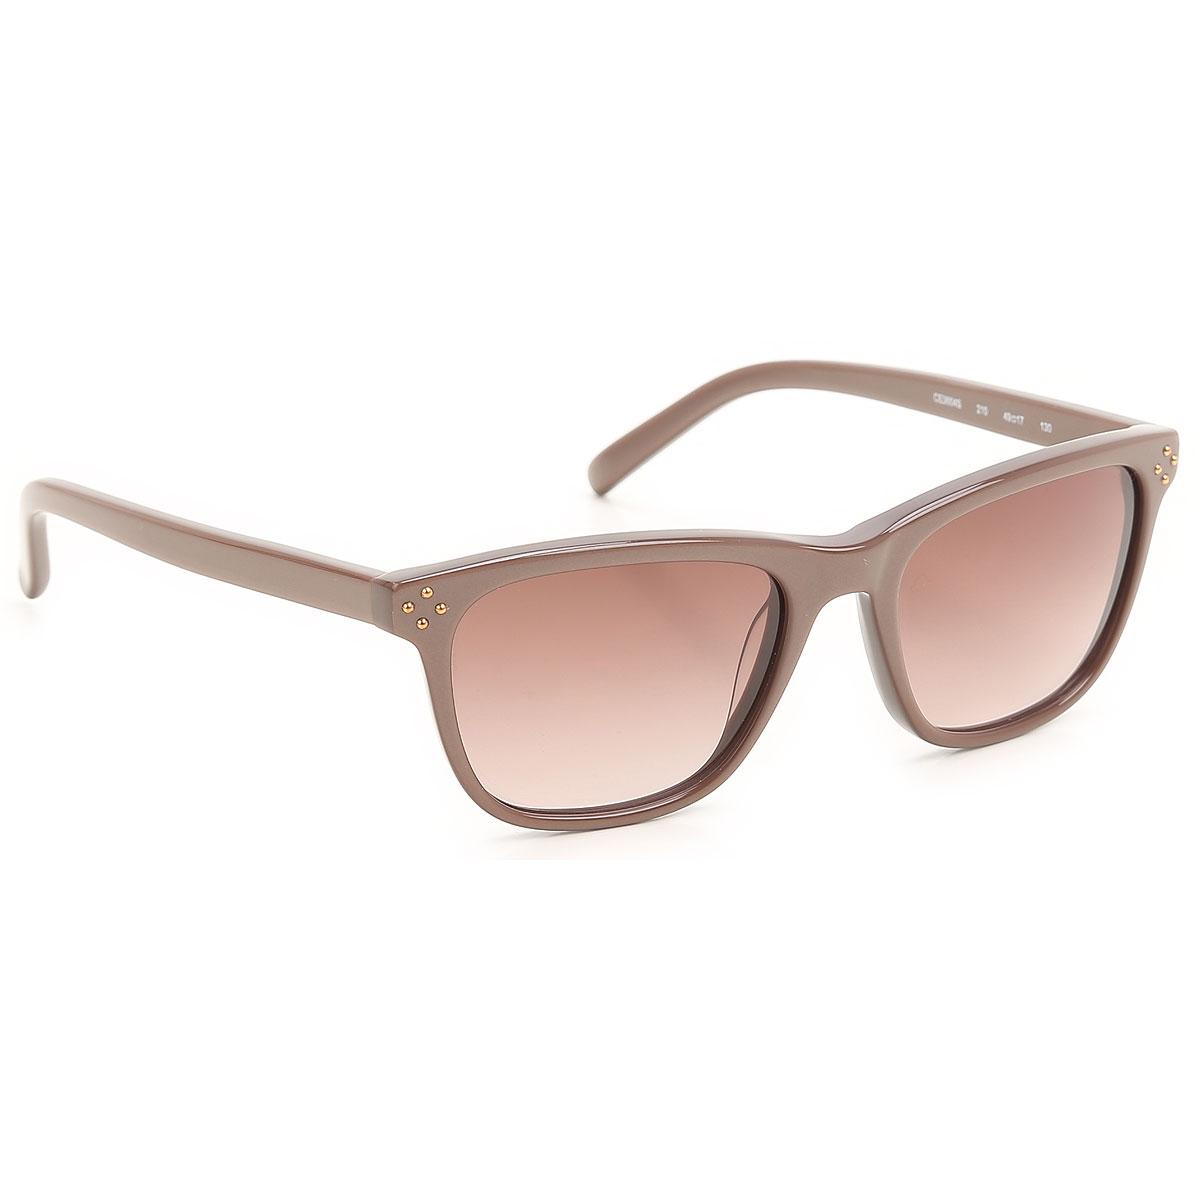 Image of Chloe Kids Sunglasses for Girls On Sale, Deep Taupe, 2017